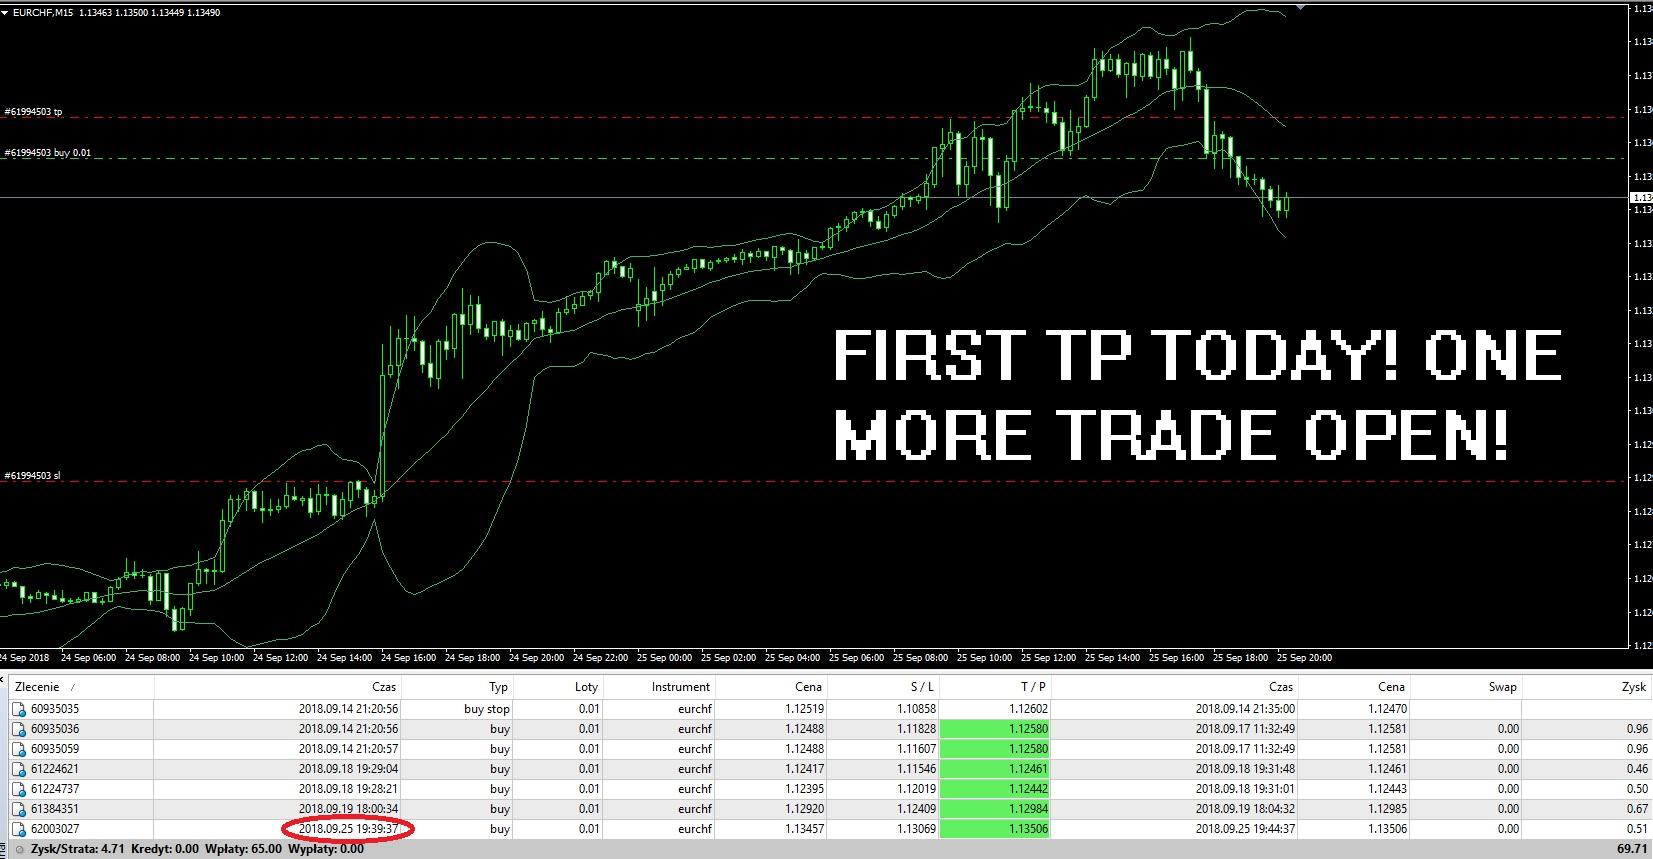 First TP today, just one more trade open :) waiting for this! PRICE 75$ UNTILL 12.10! PRICE 75$ UNTILL 12.10! PRICE 75$ UNTILL 12.10! PRICE 75$ UNTILL 12.10!  https://www.mql5.com/en/market/product/31642# - EA  www.mql5.com/en/signals/471373 - SIGNAL